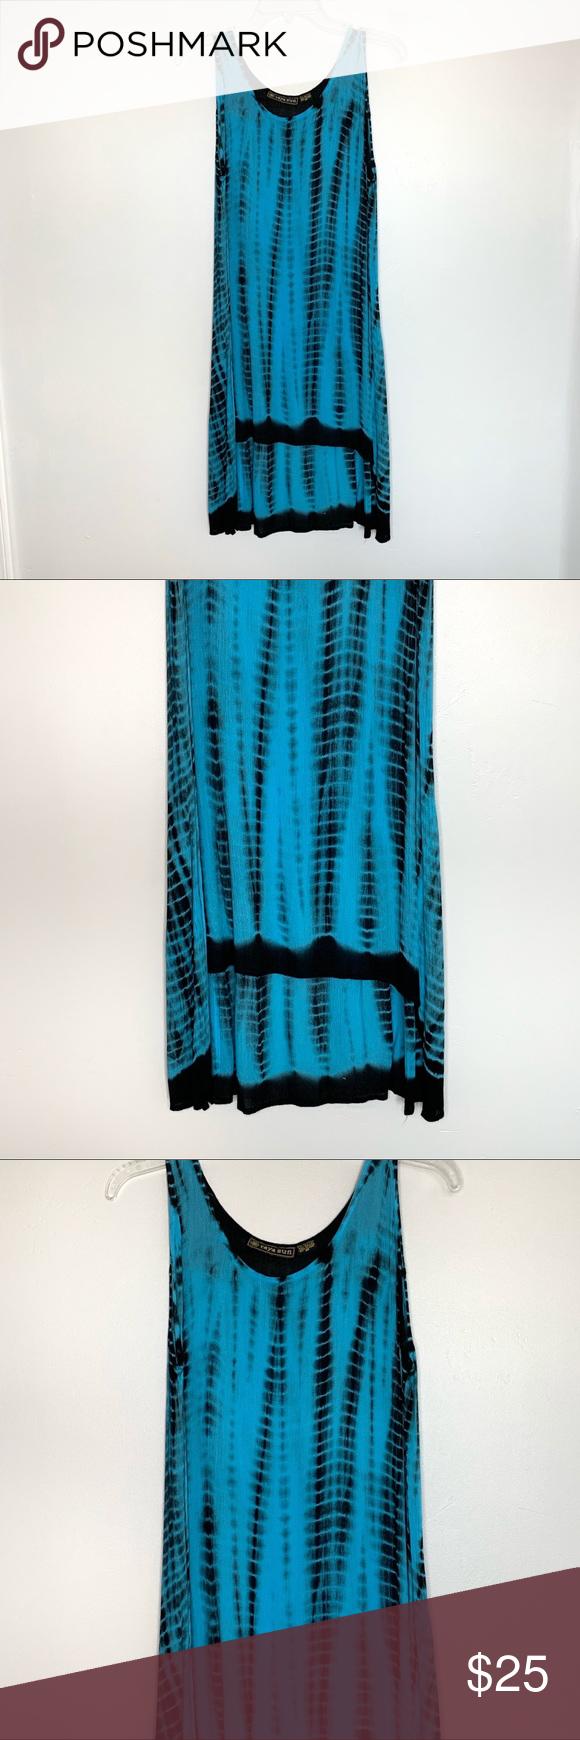 NEW Raya Sun Turqouise Black Tie Dye Dress Black tie